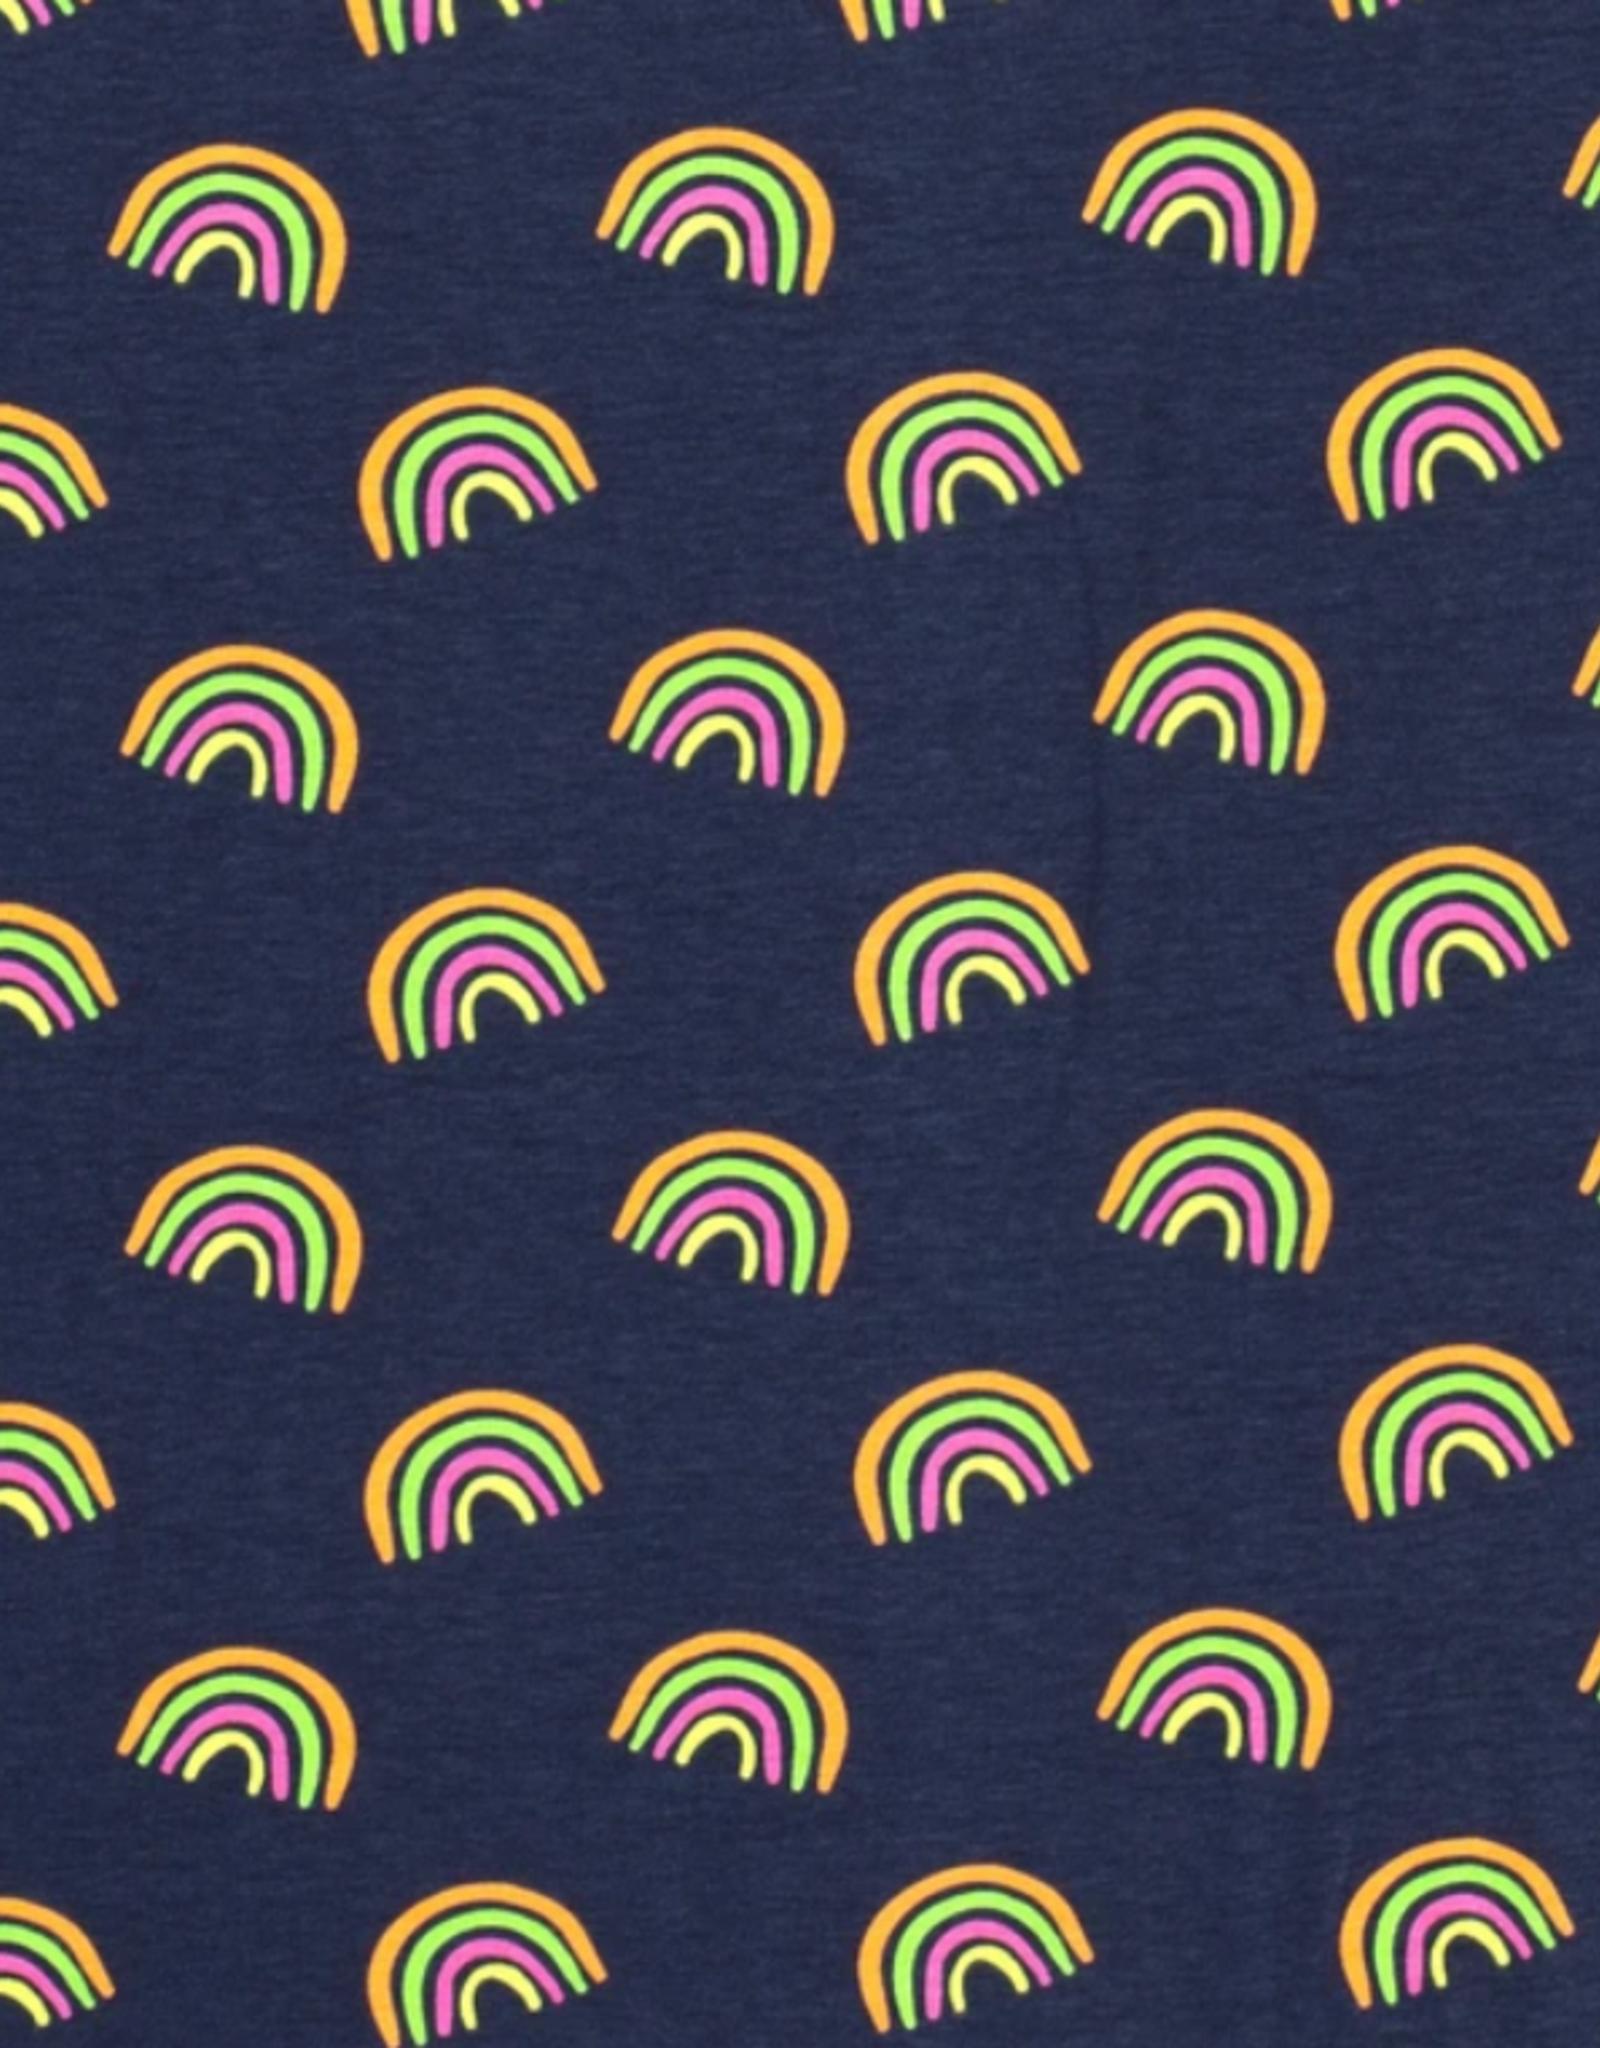 Tricot - NEON - Rainbow